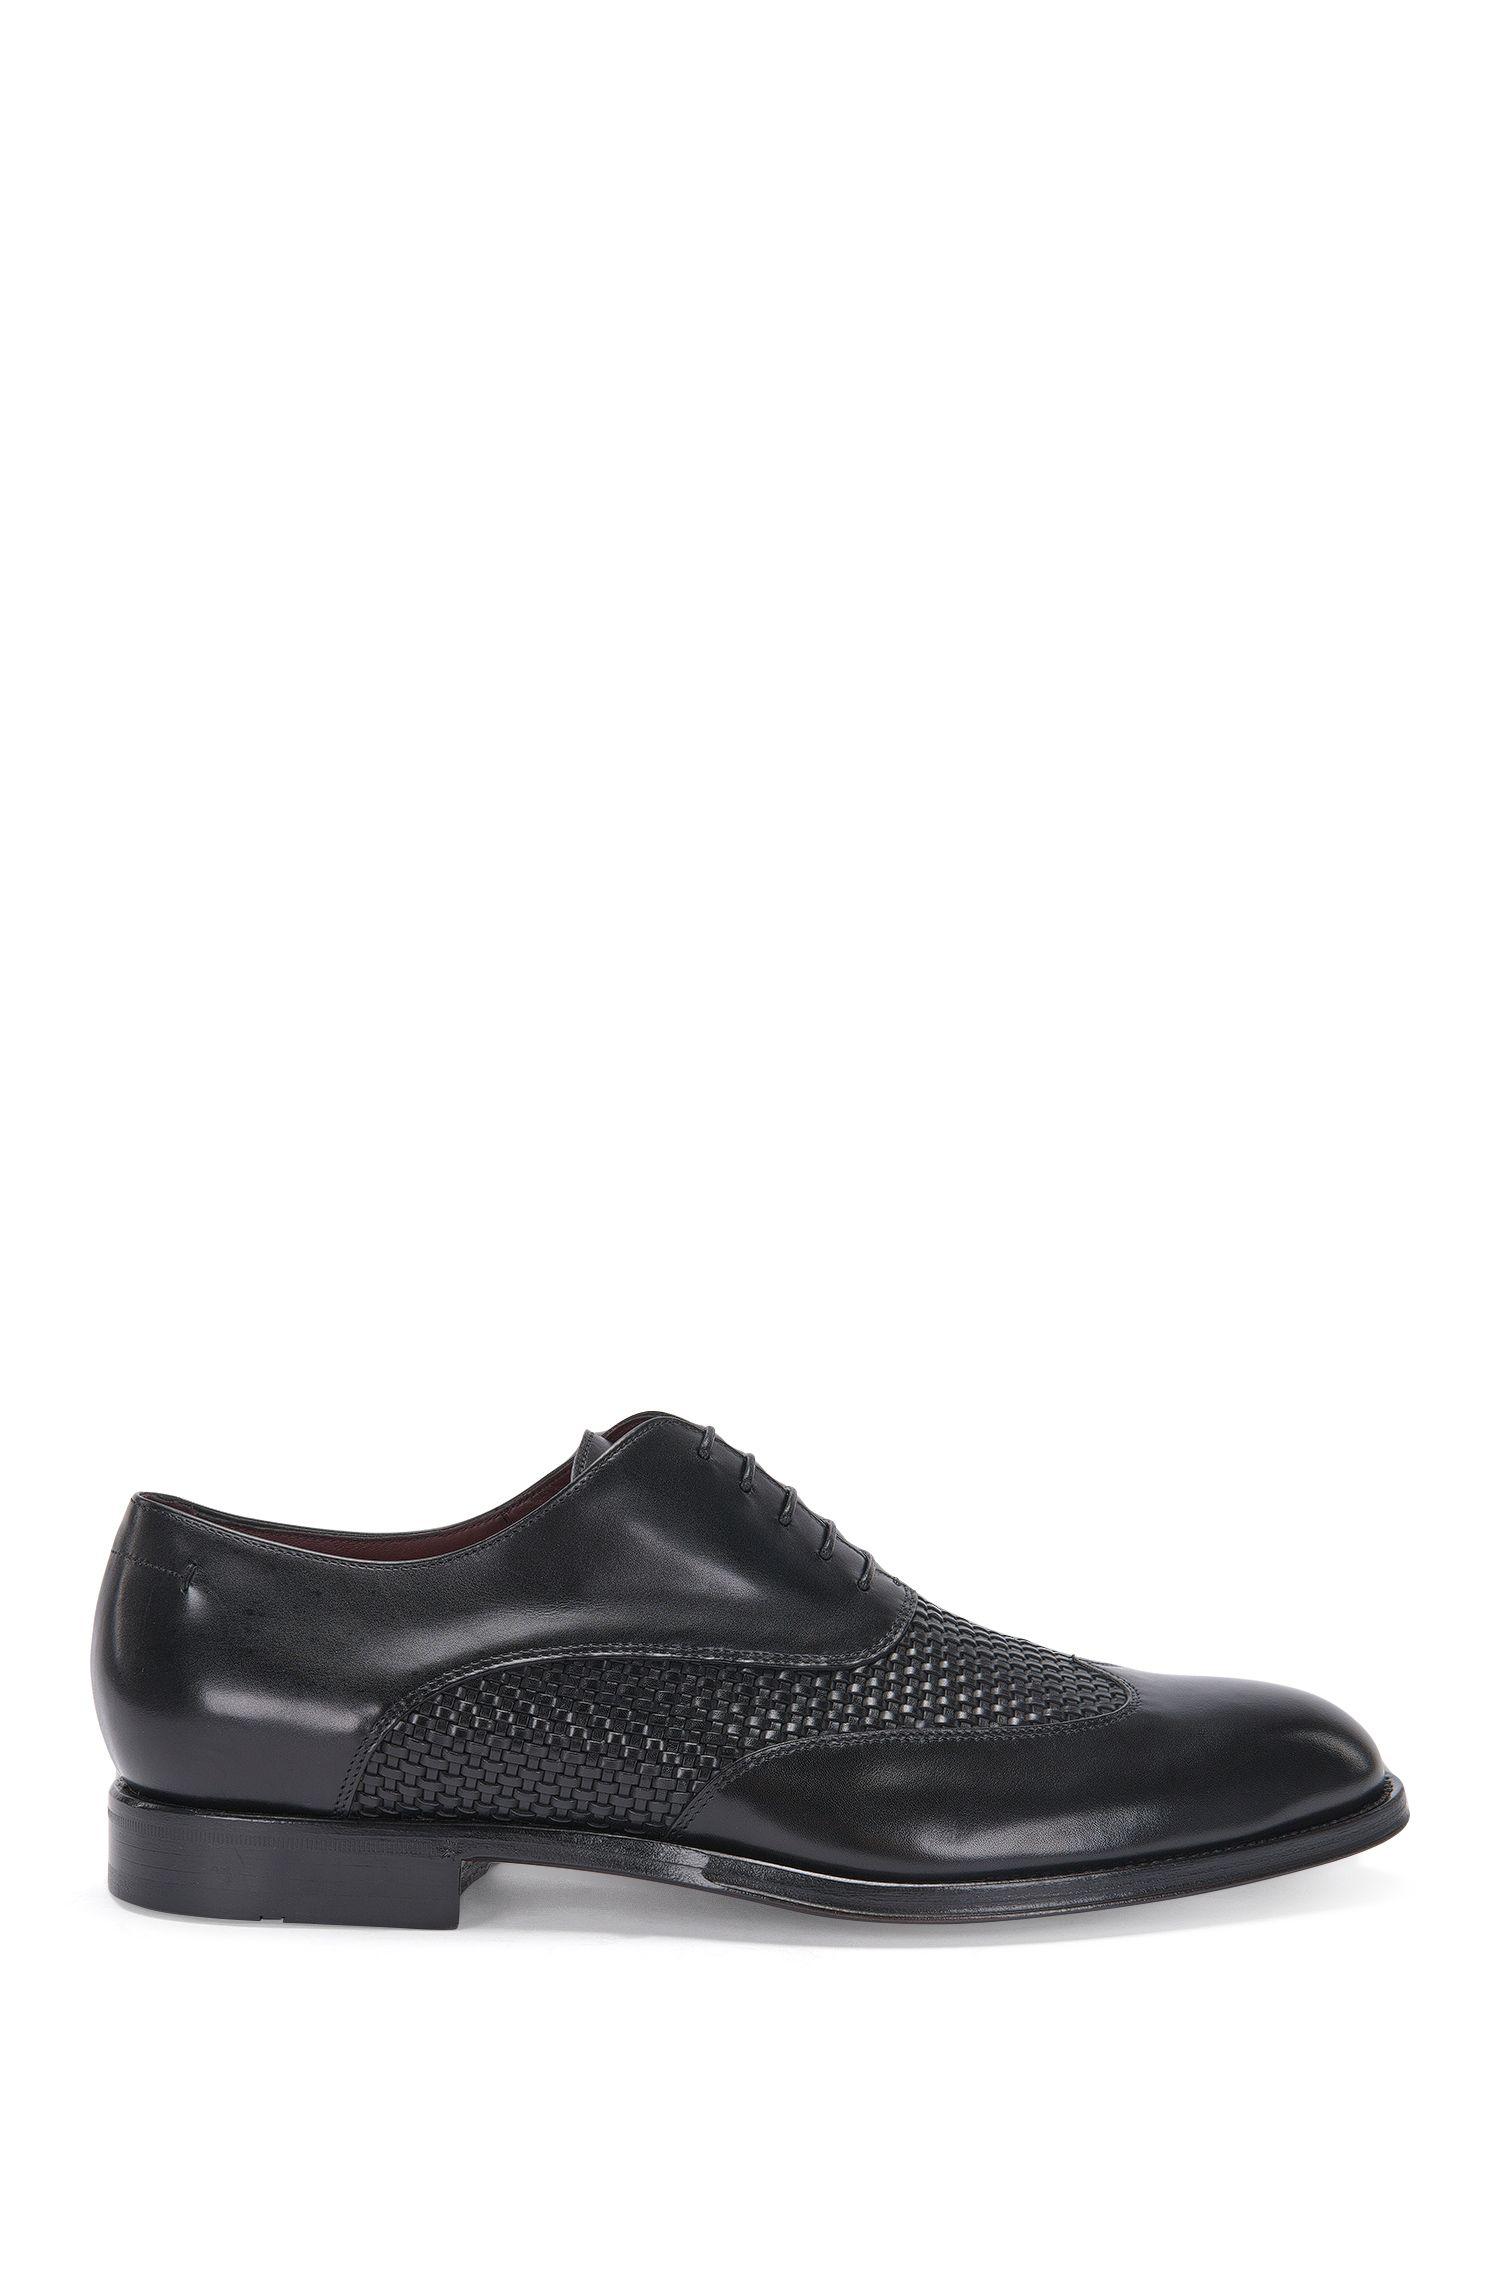 Italian Calfskin Woven Wingtip Oxford Shoe | T-Idol Oxfr Wowt